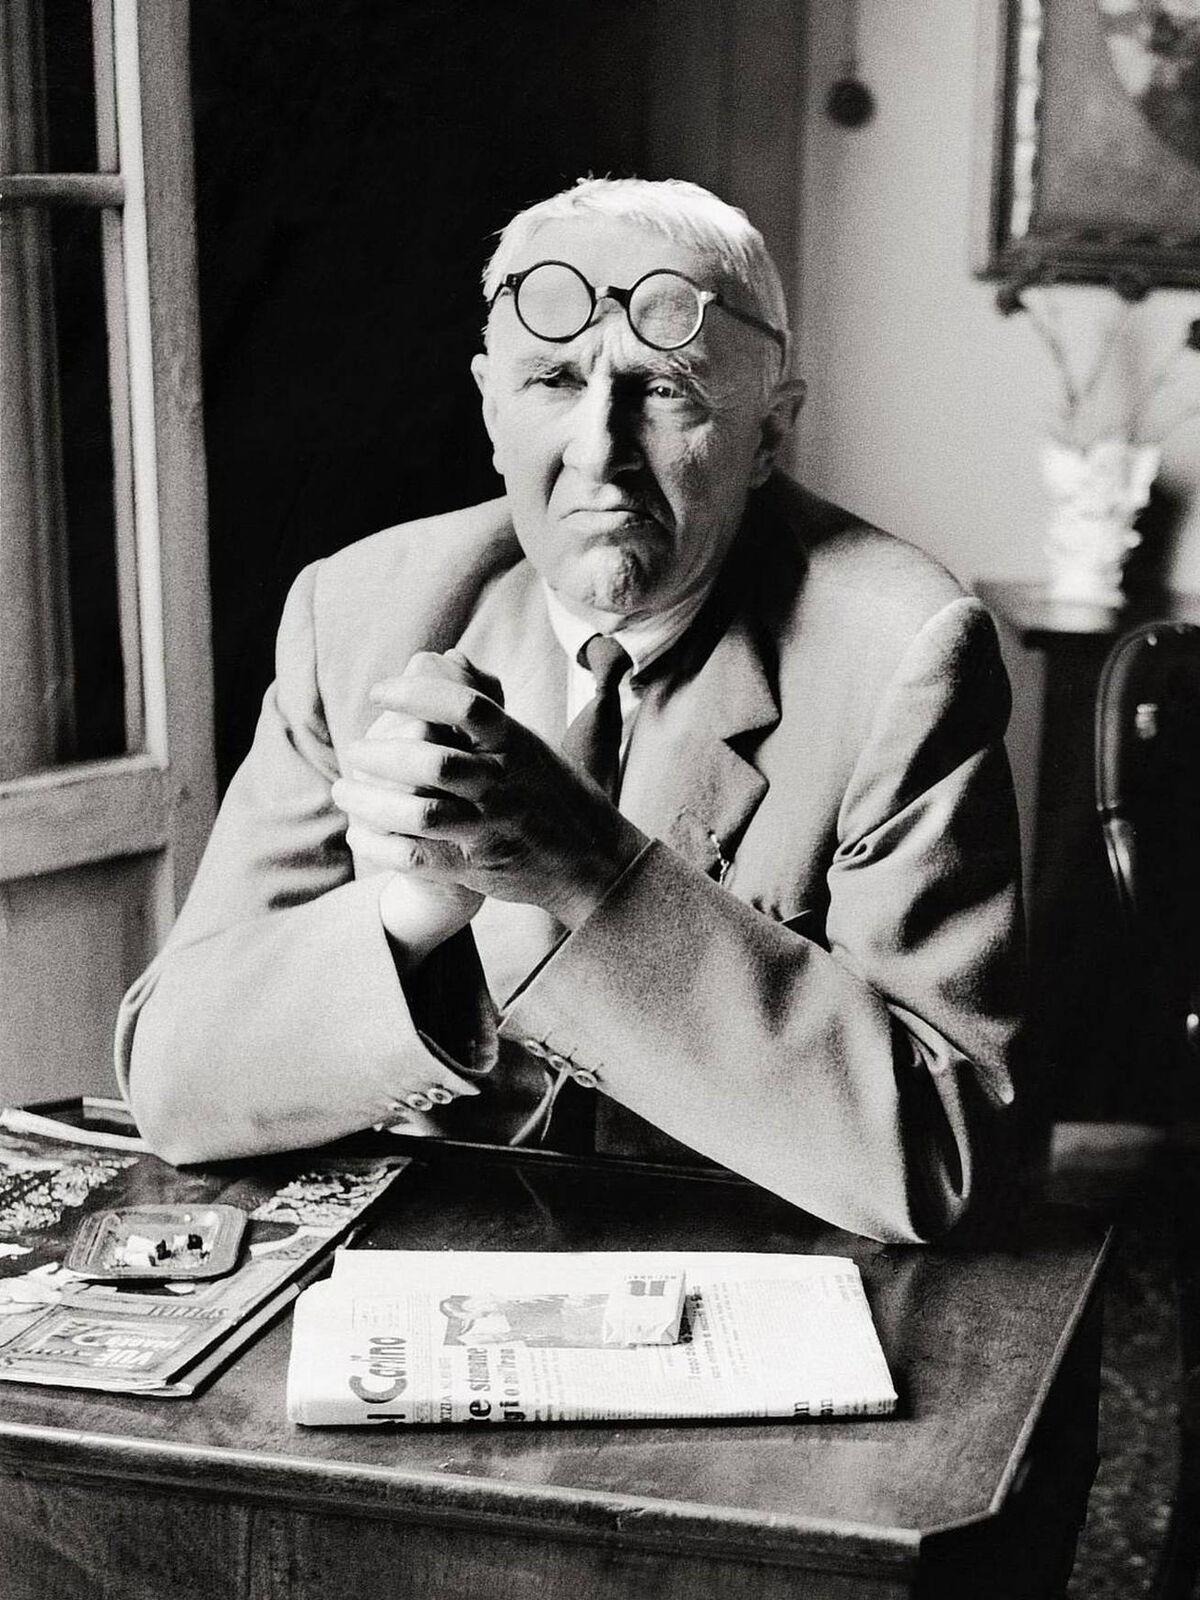 Portrait of Giorgio Morandi, via Wikimedia Commons.